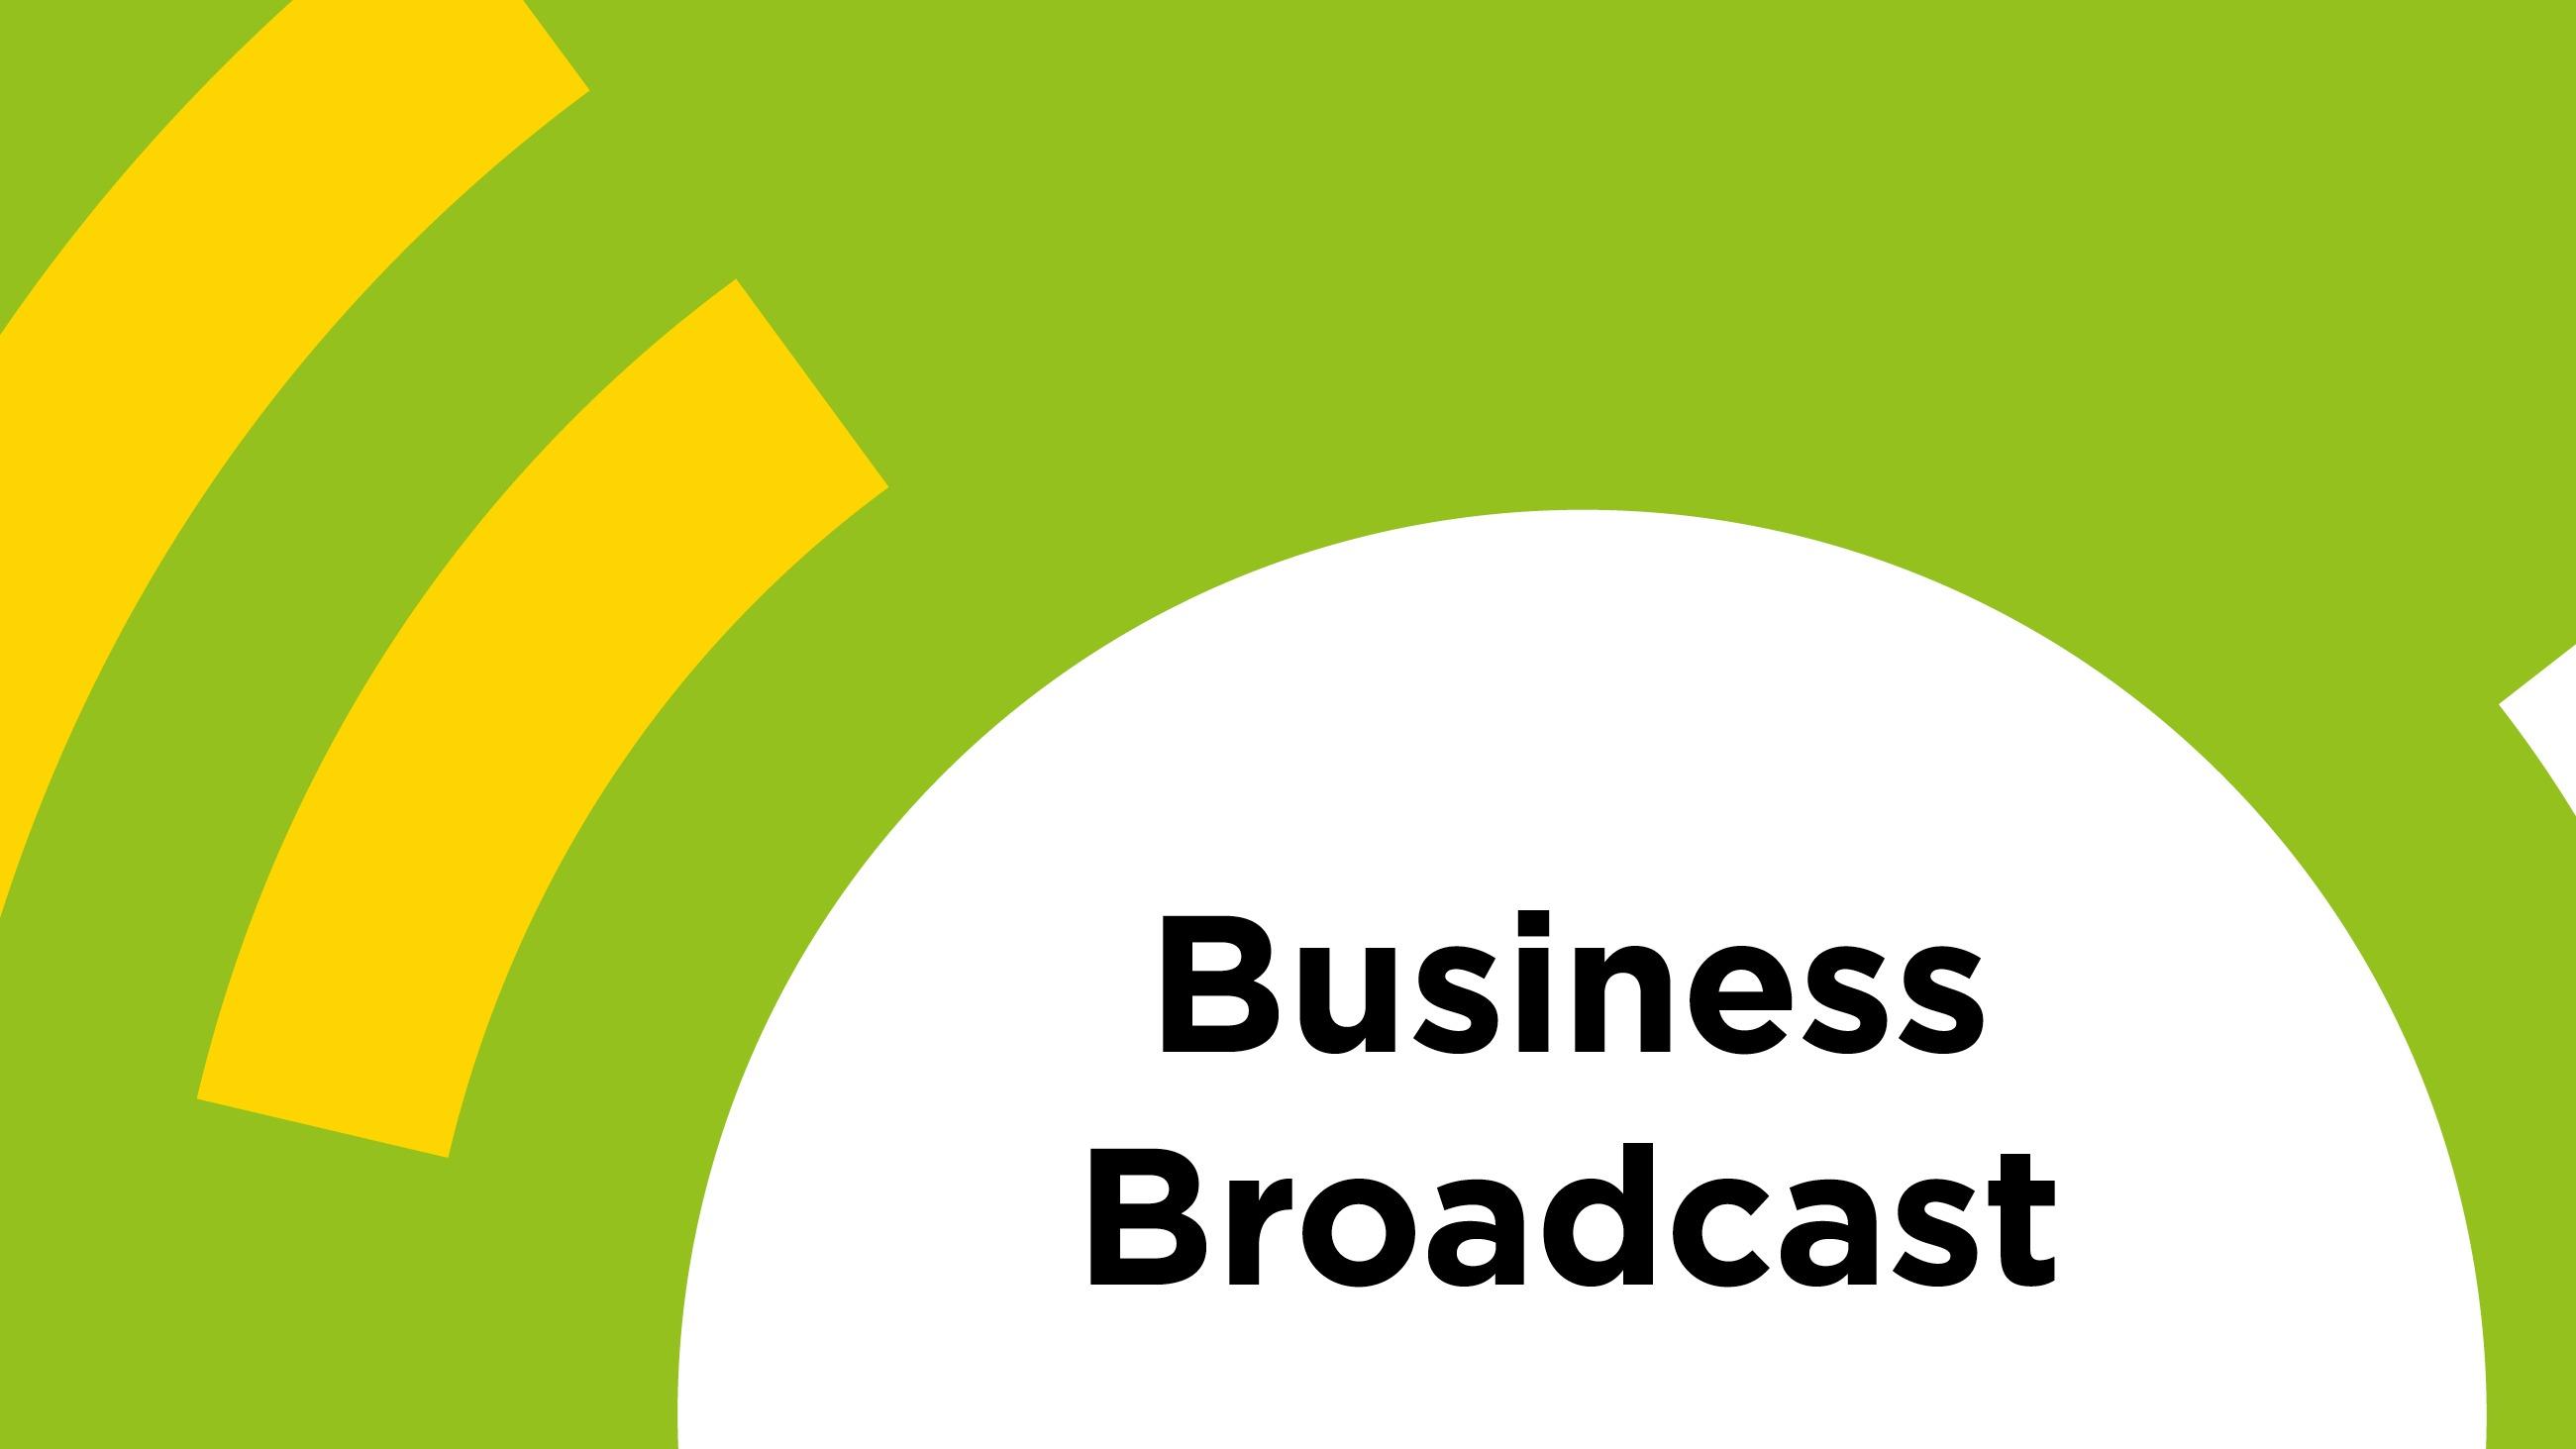 Business Broadcast